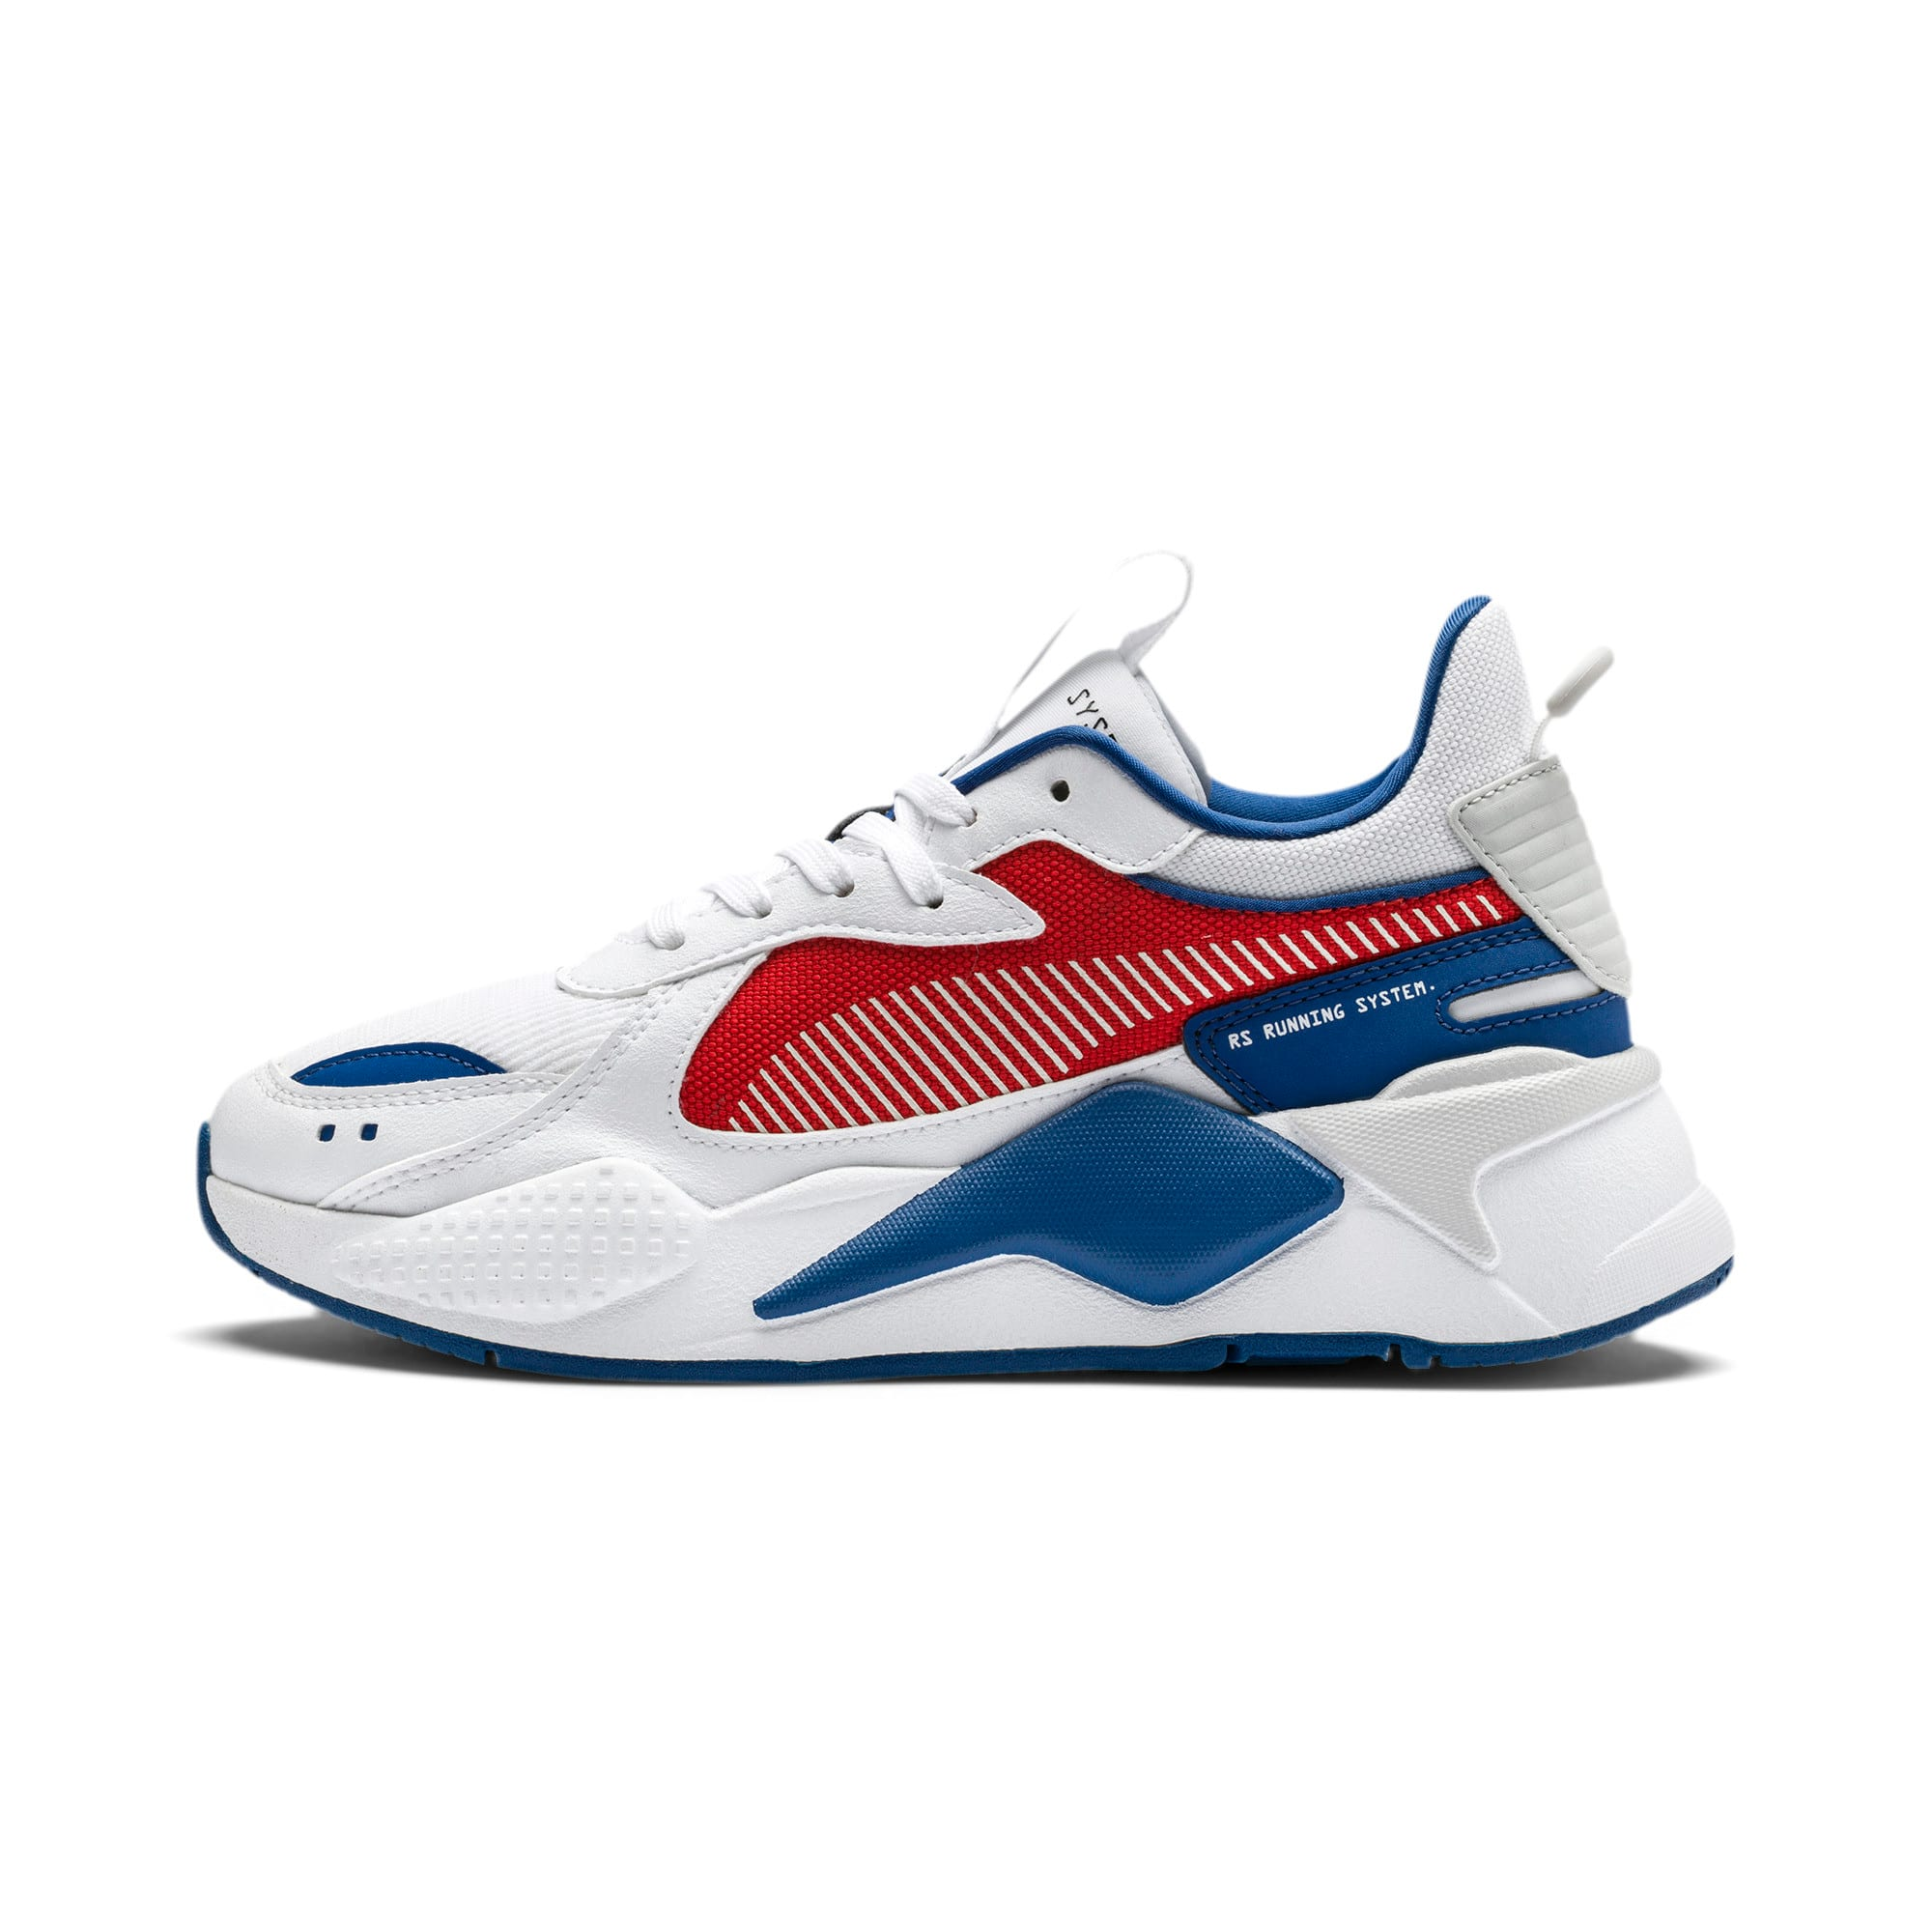 Thumbnail 1 of RS-X Hard Drive Sneakers JR, Puma White-High Risk Red, medium